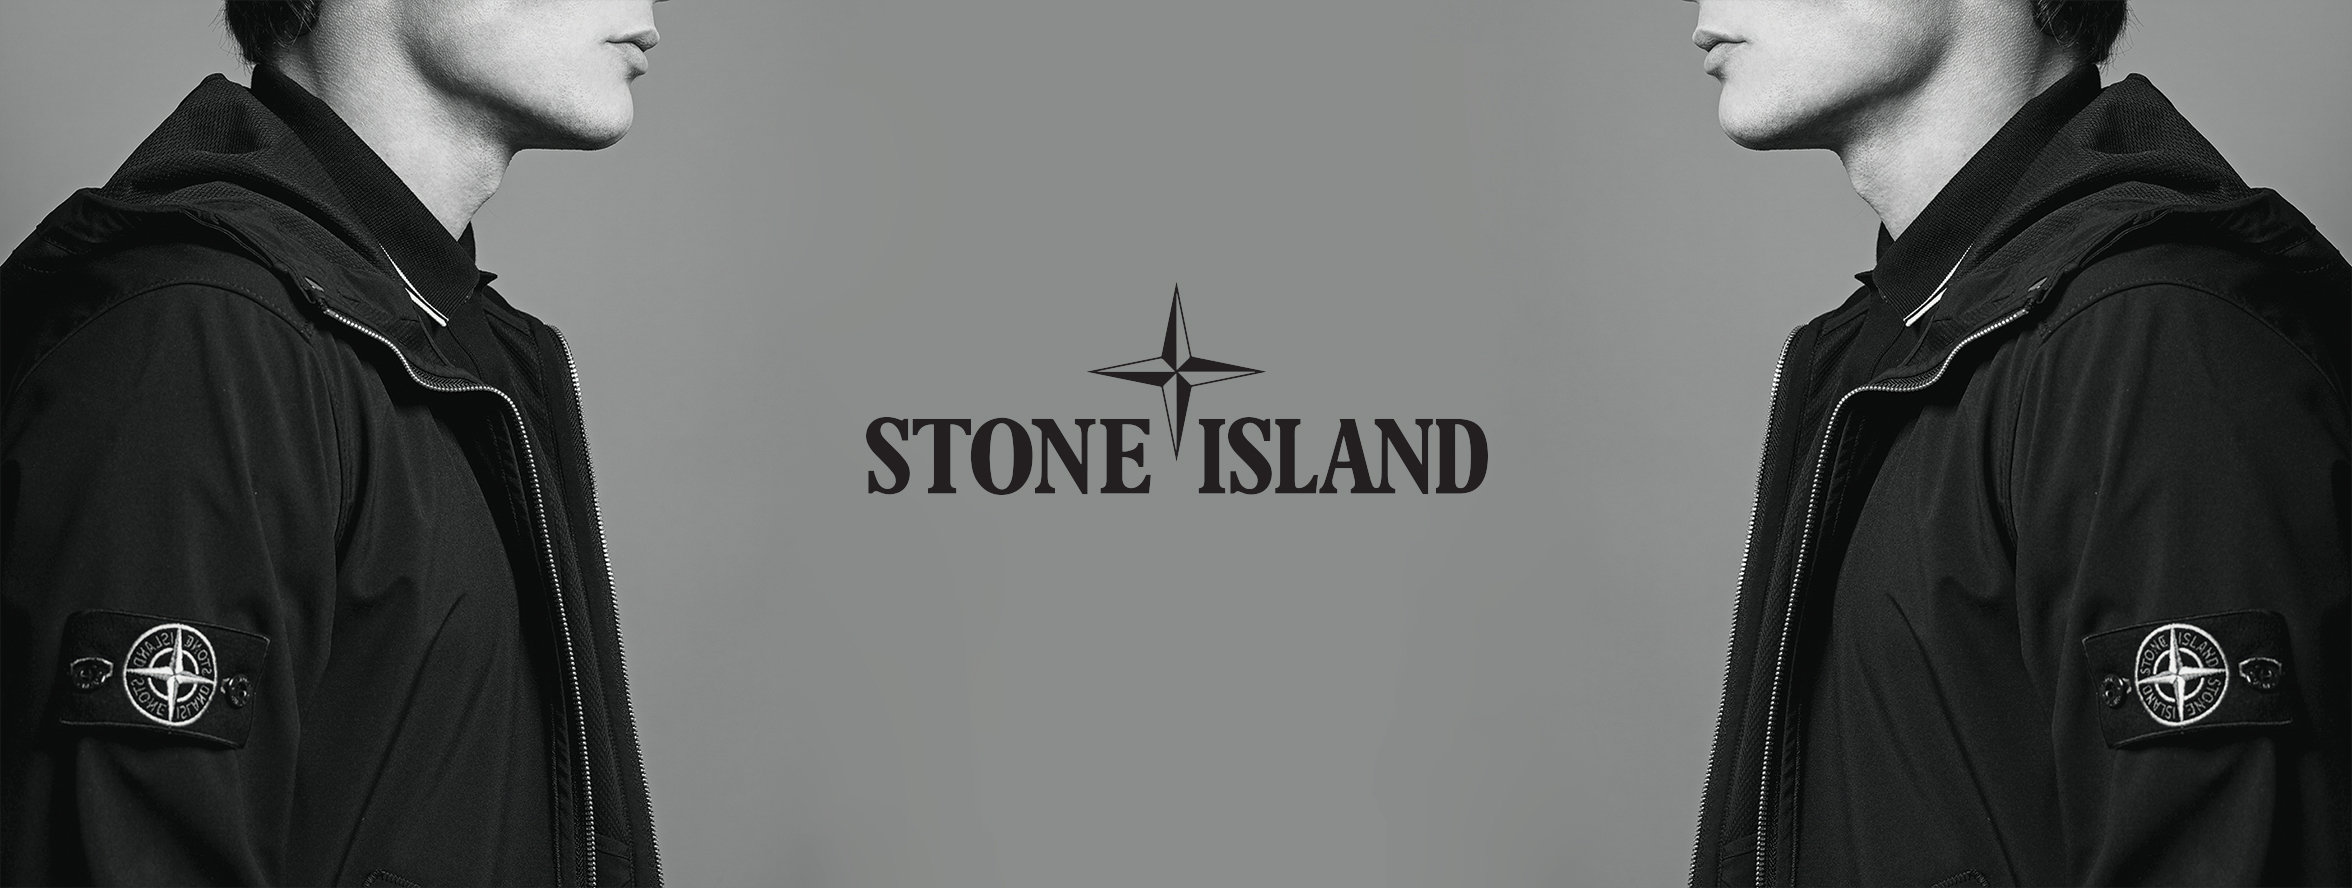 Stone Island - Biagetti Bologna